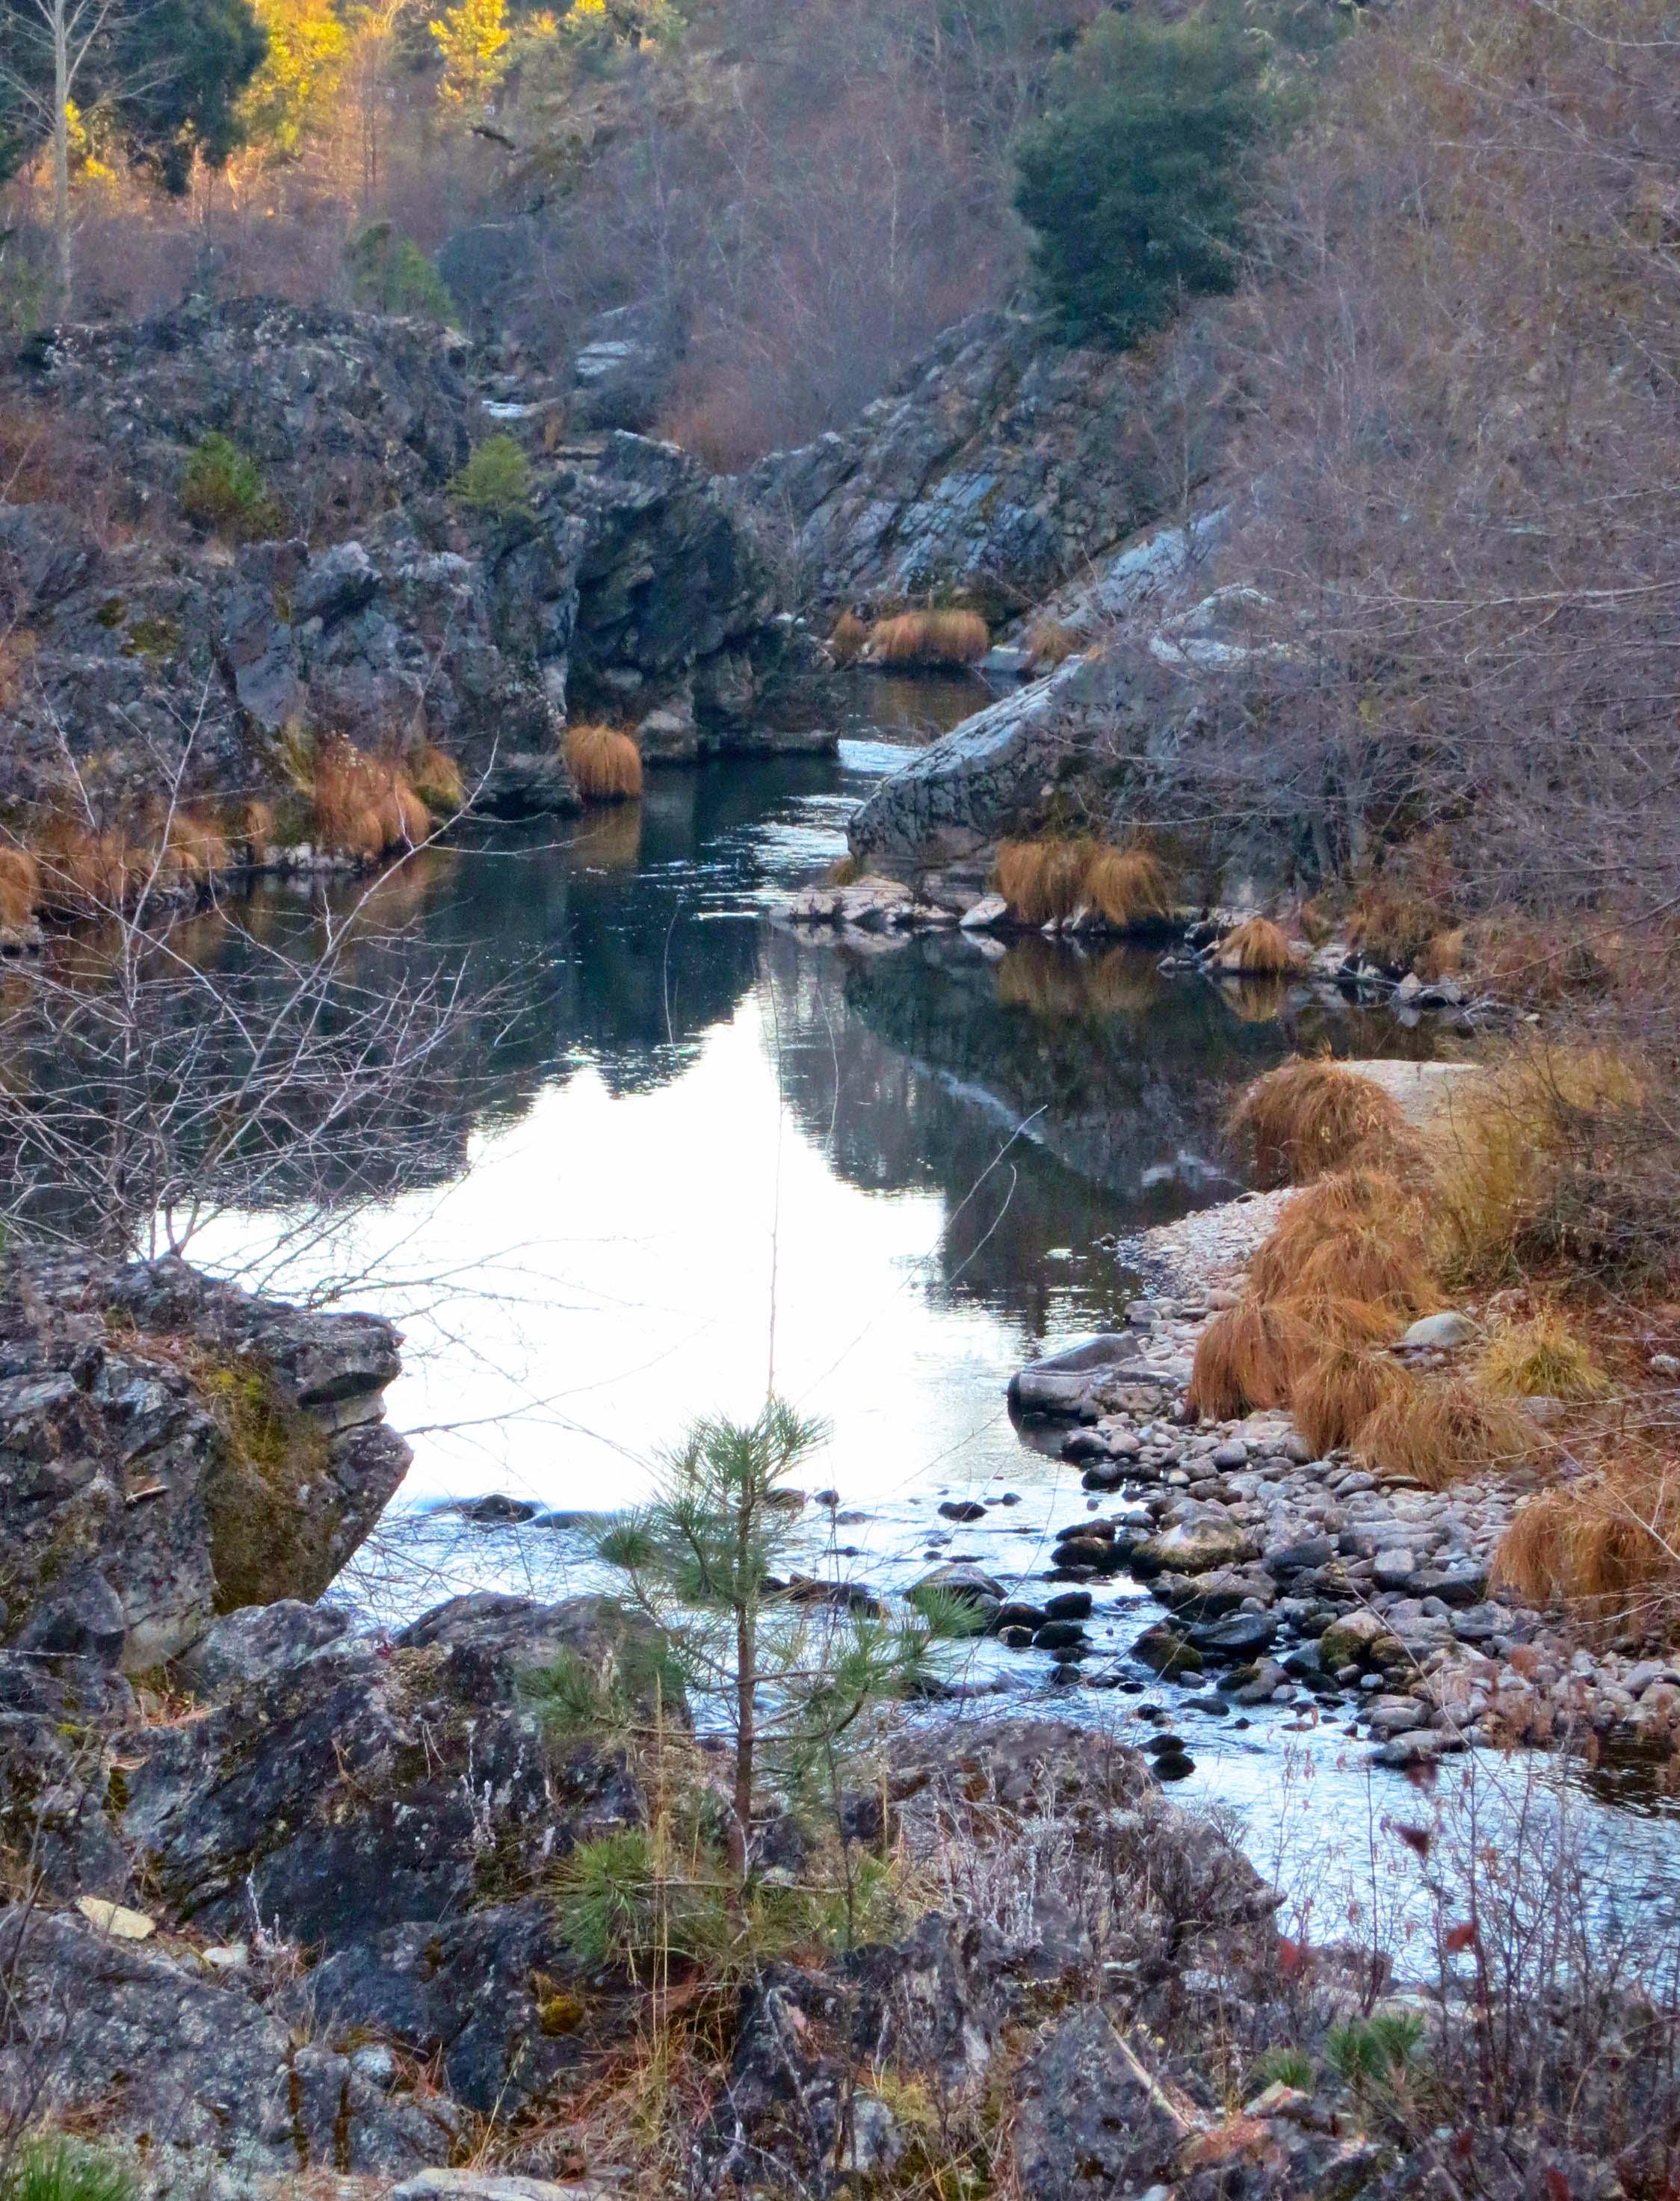 Applegate river in winter. Photo by Curtis Mekemson.